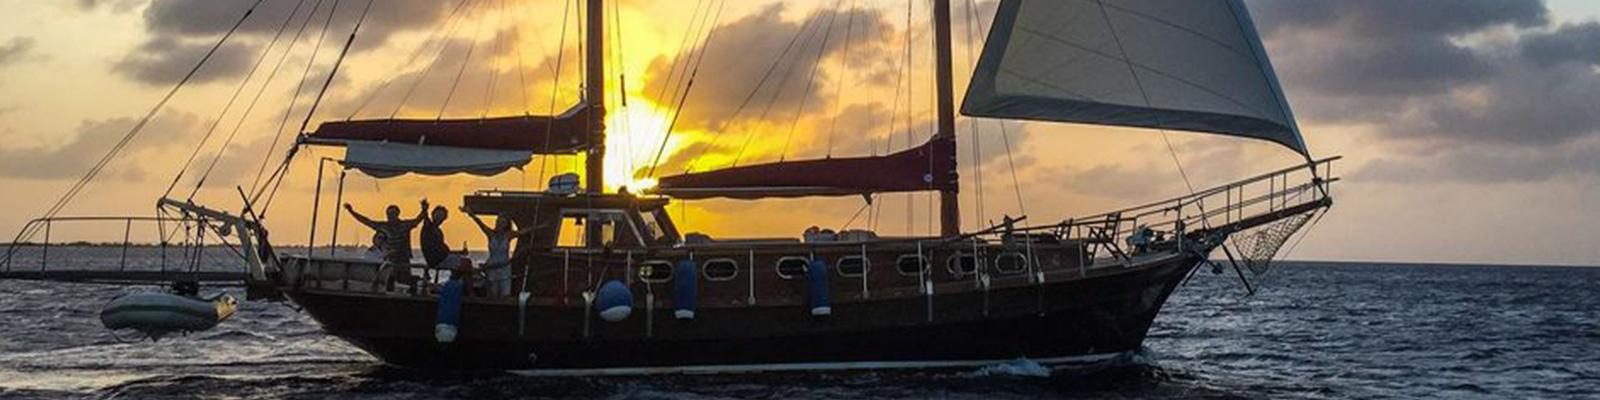 melisa-sailing-slider-img-1